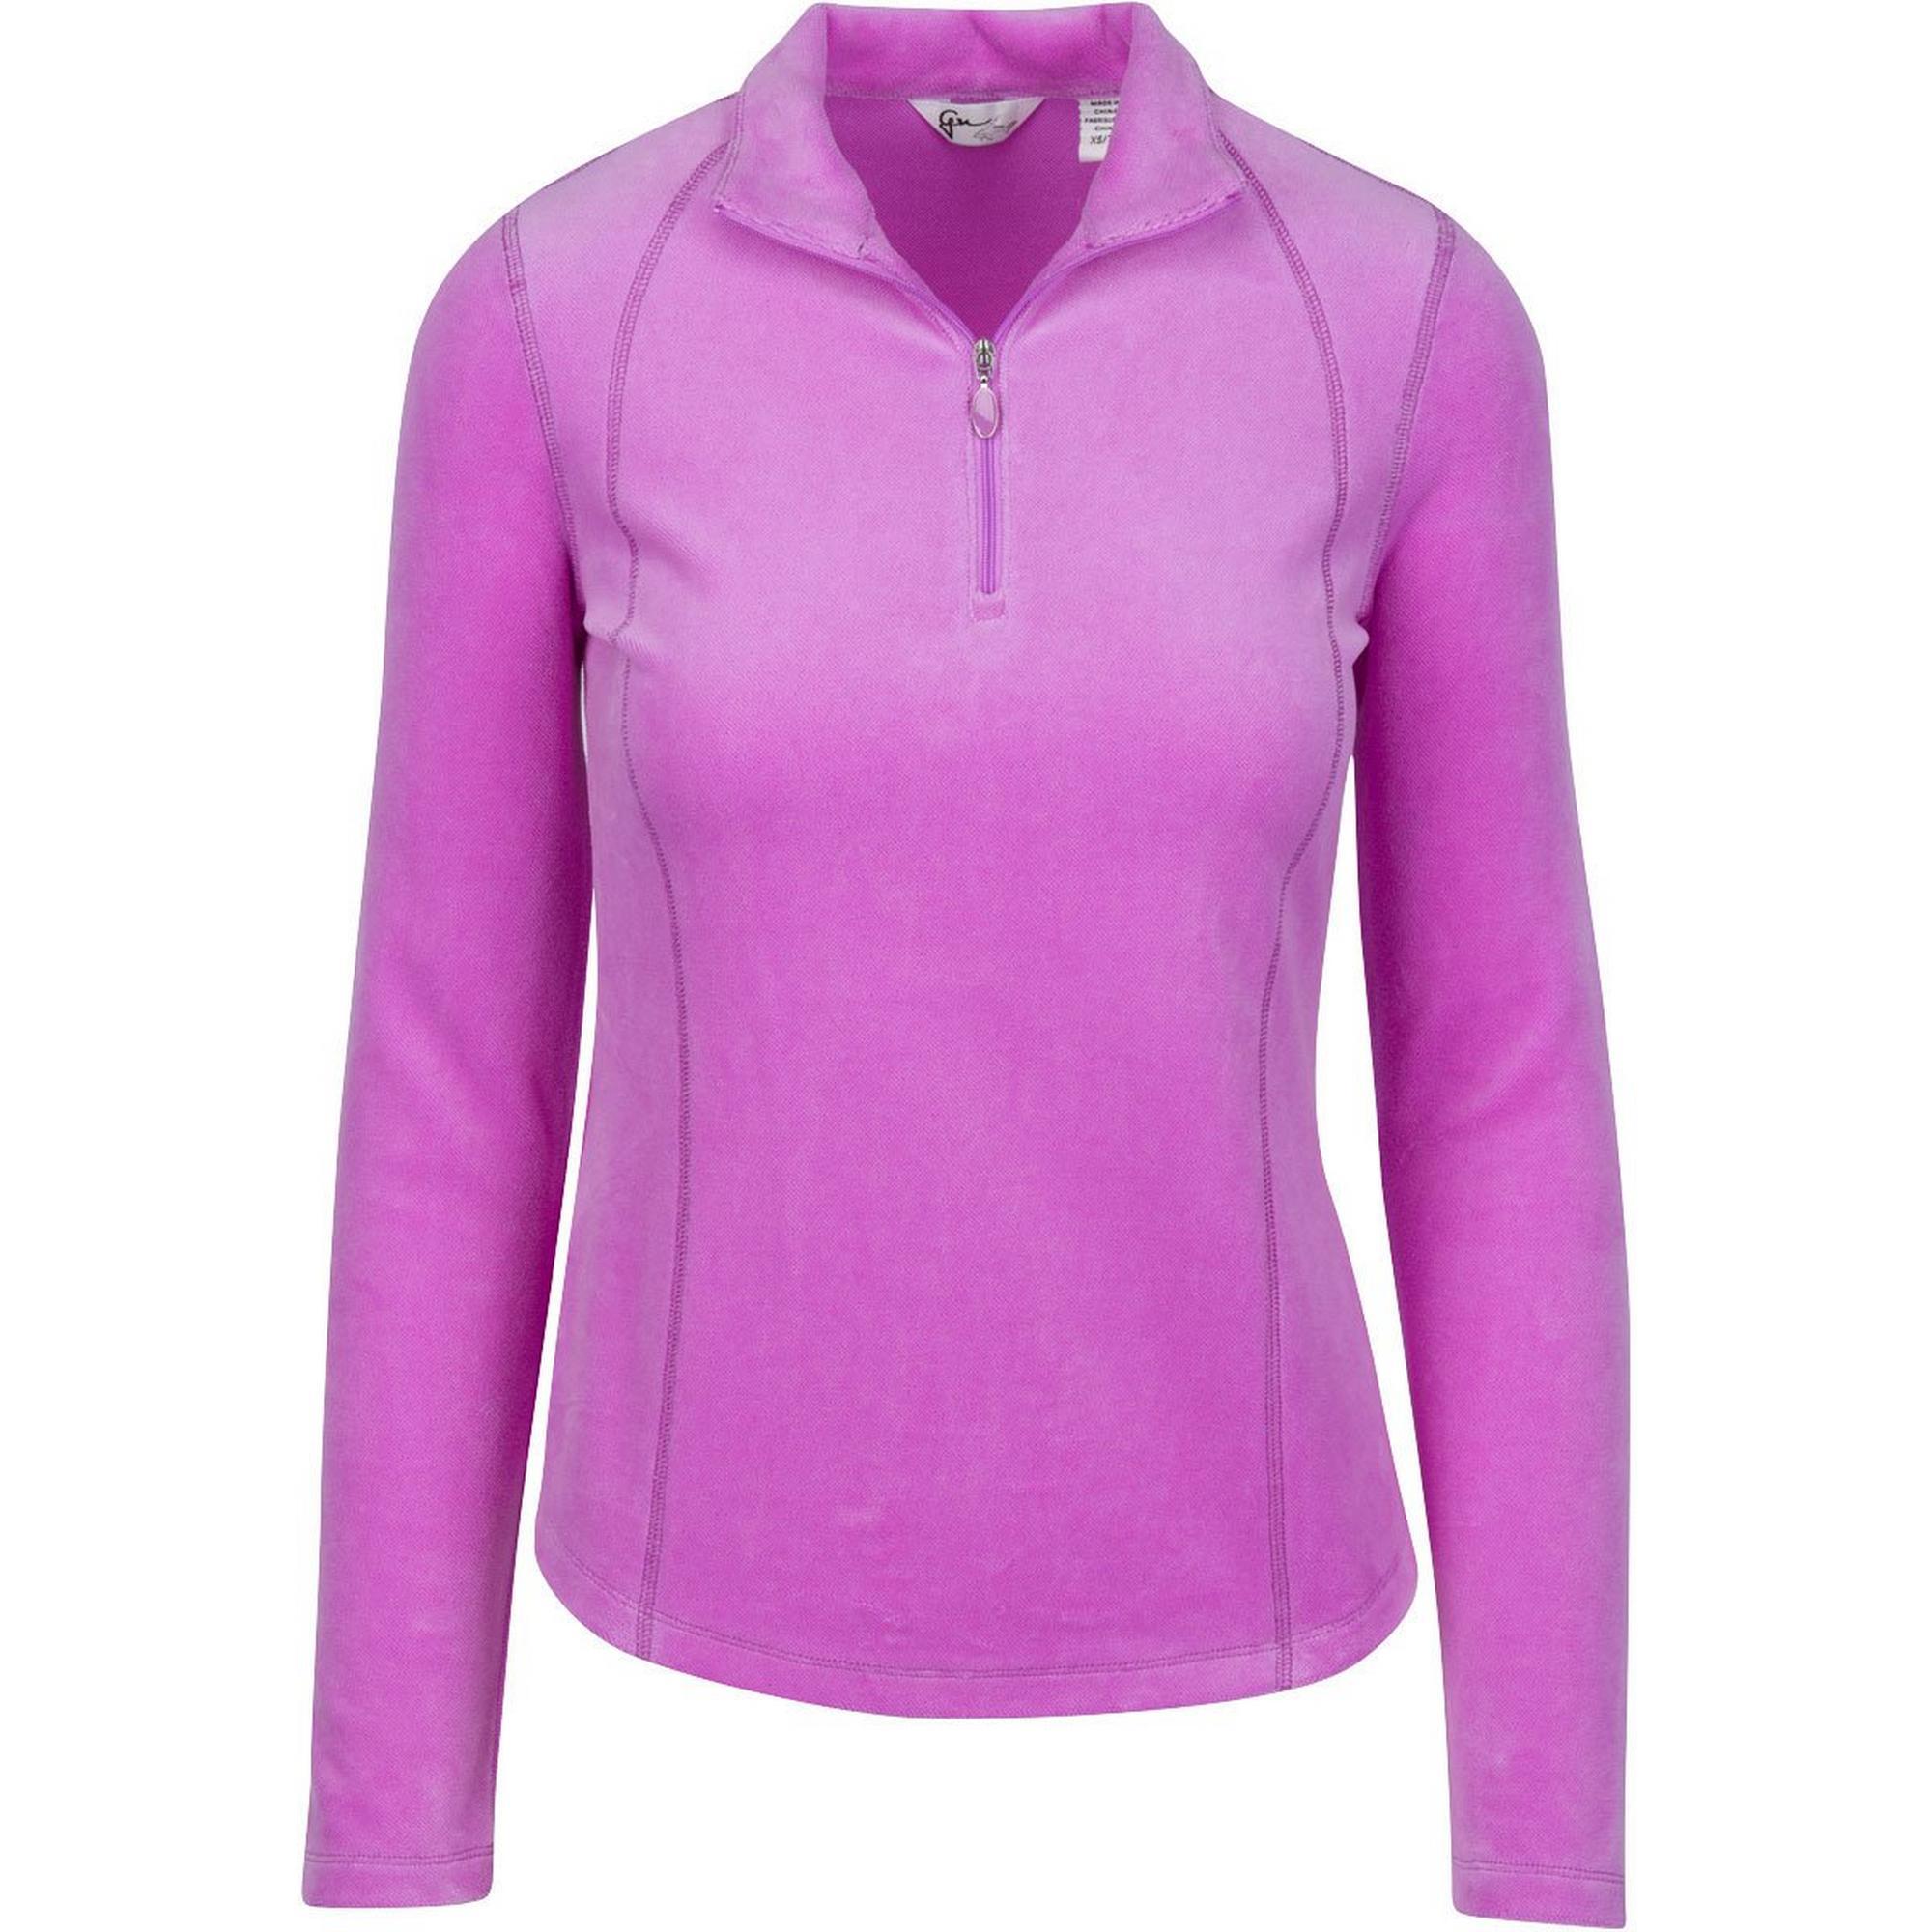 Women's Quarter Zip Plush Pique Velour Long Sleeve Pullover